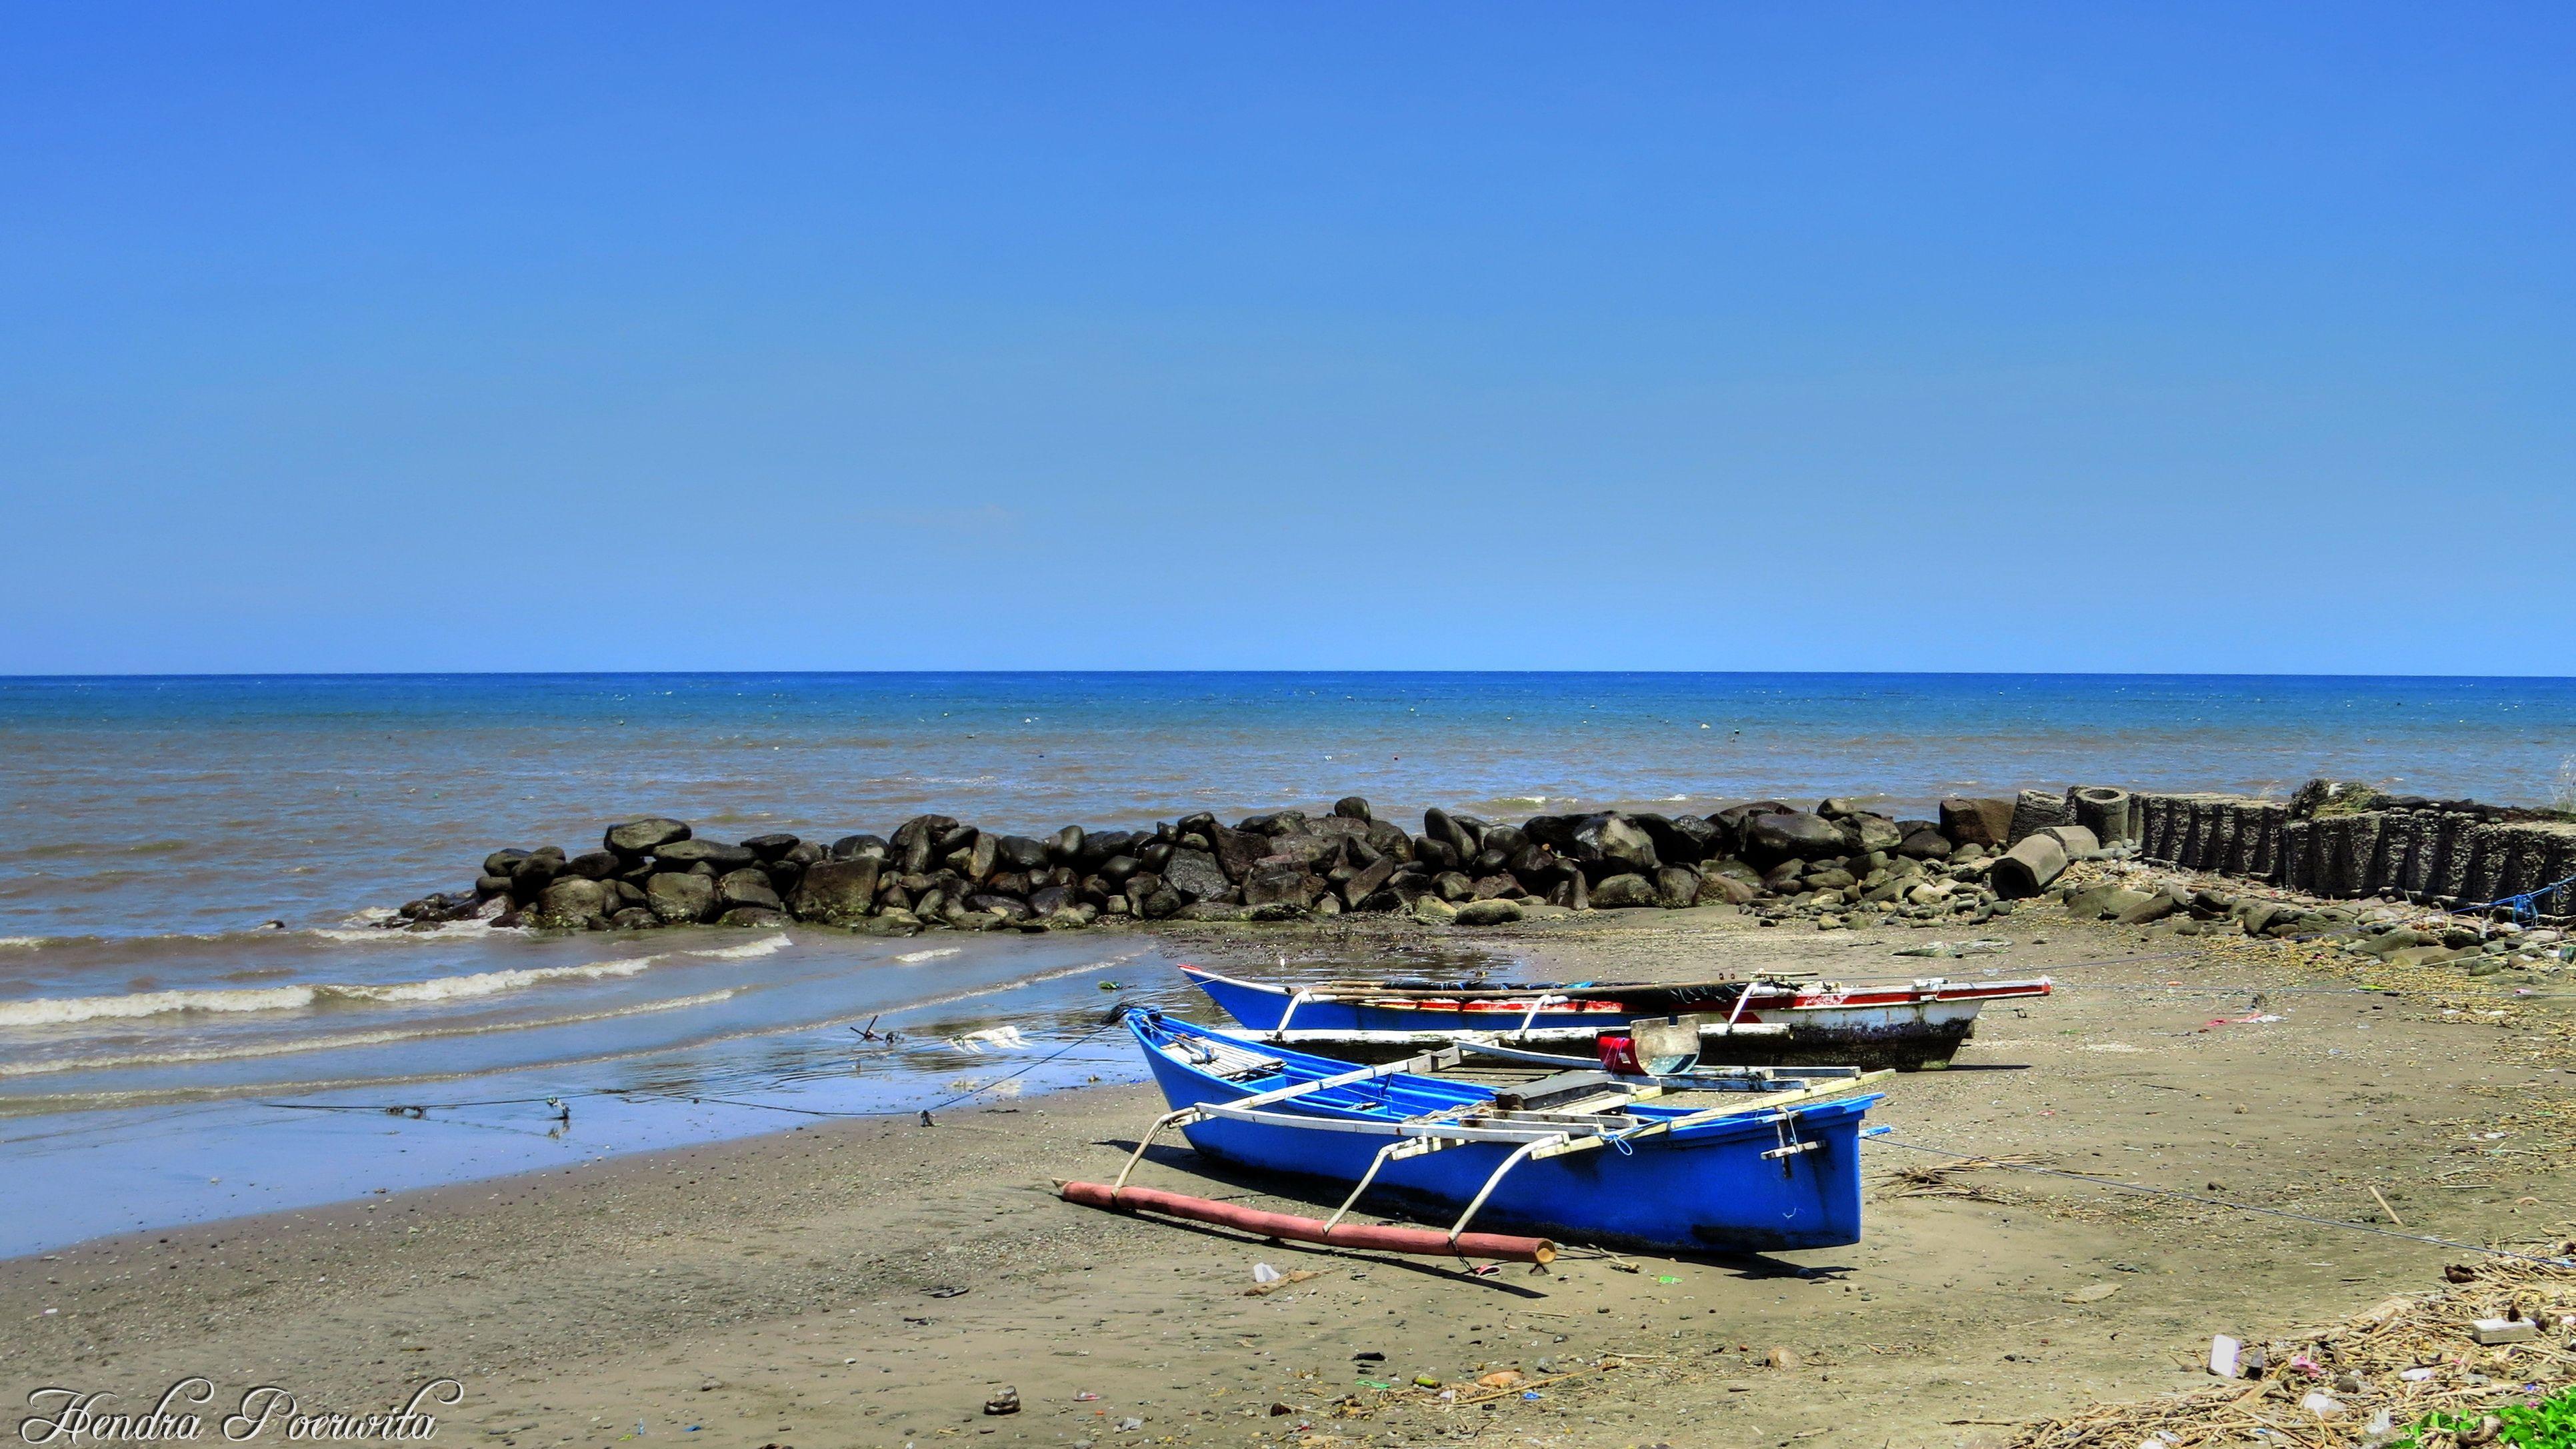 Pantai Marina Bantaeng, Sulawesi Selatan. Indonesia